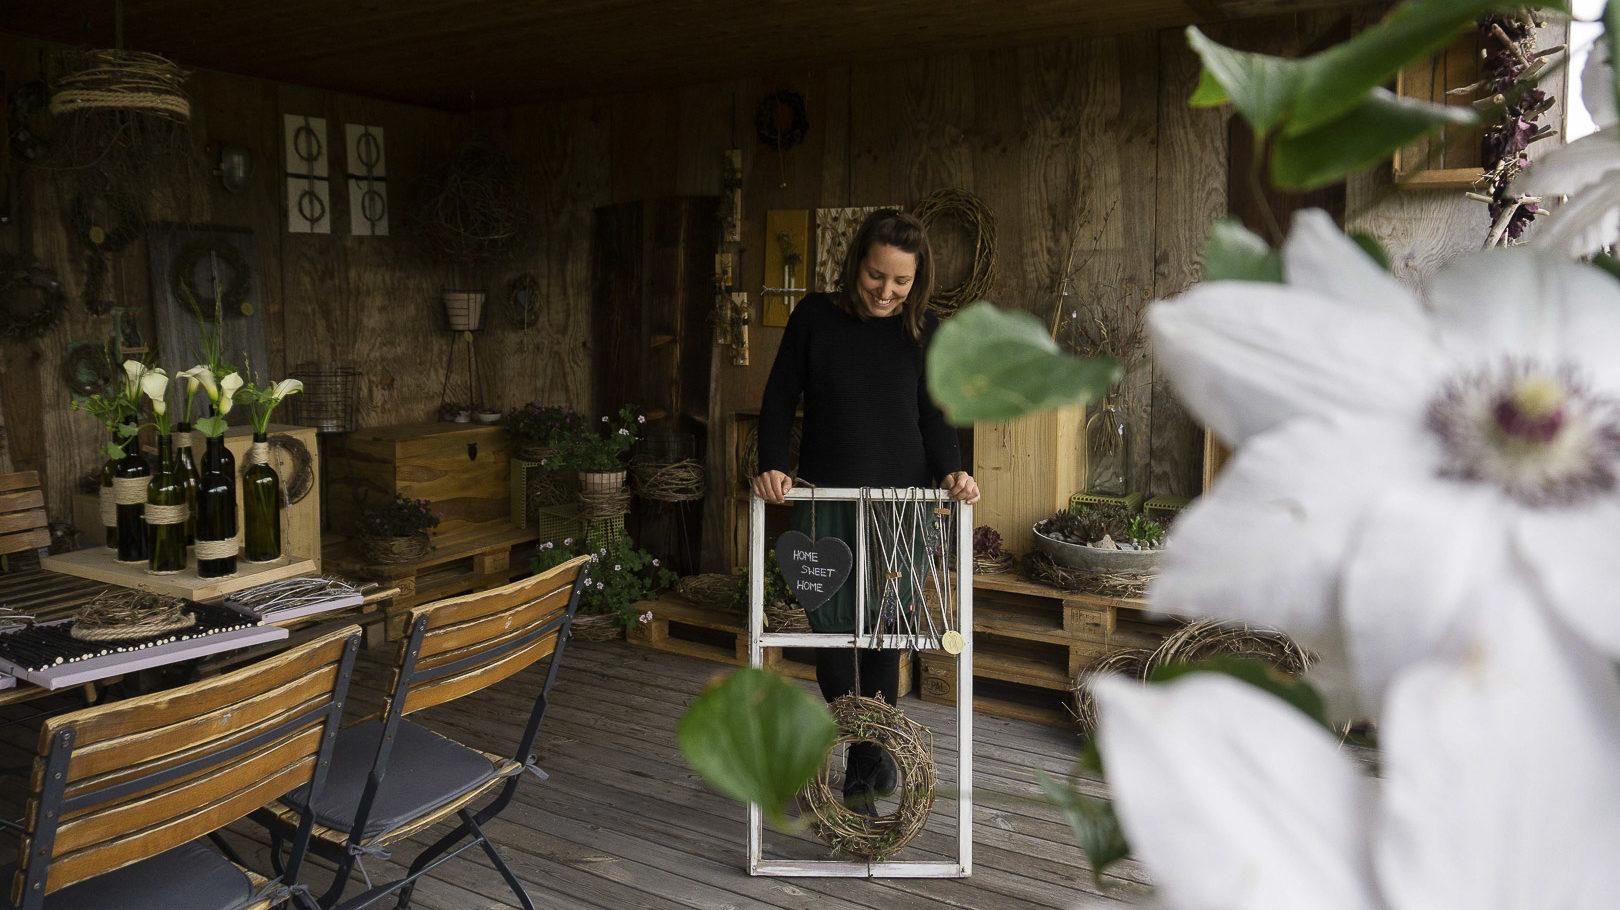 Naturfloristik Atelier mit Floristin Fabienne Waibel